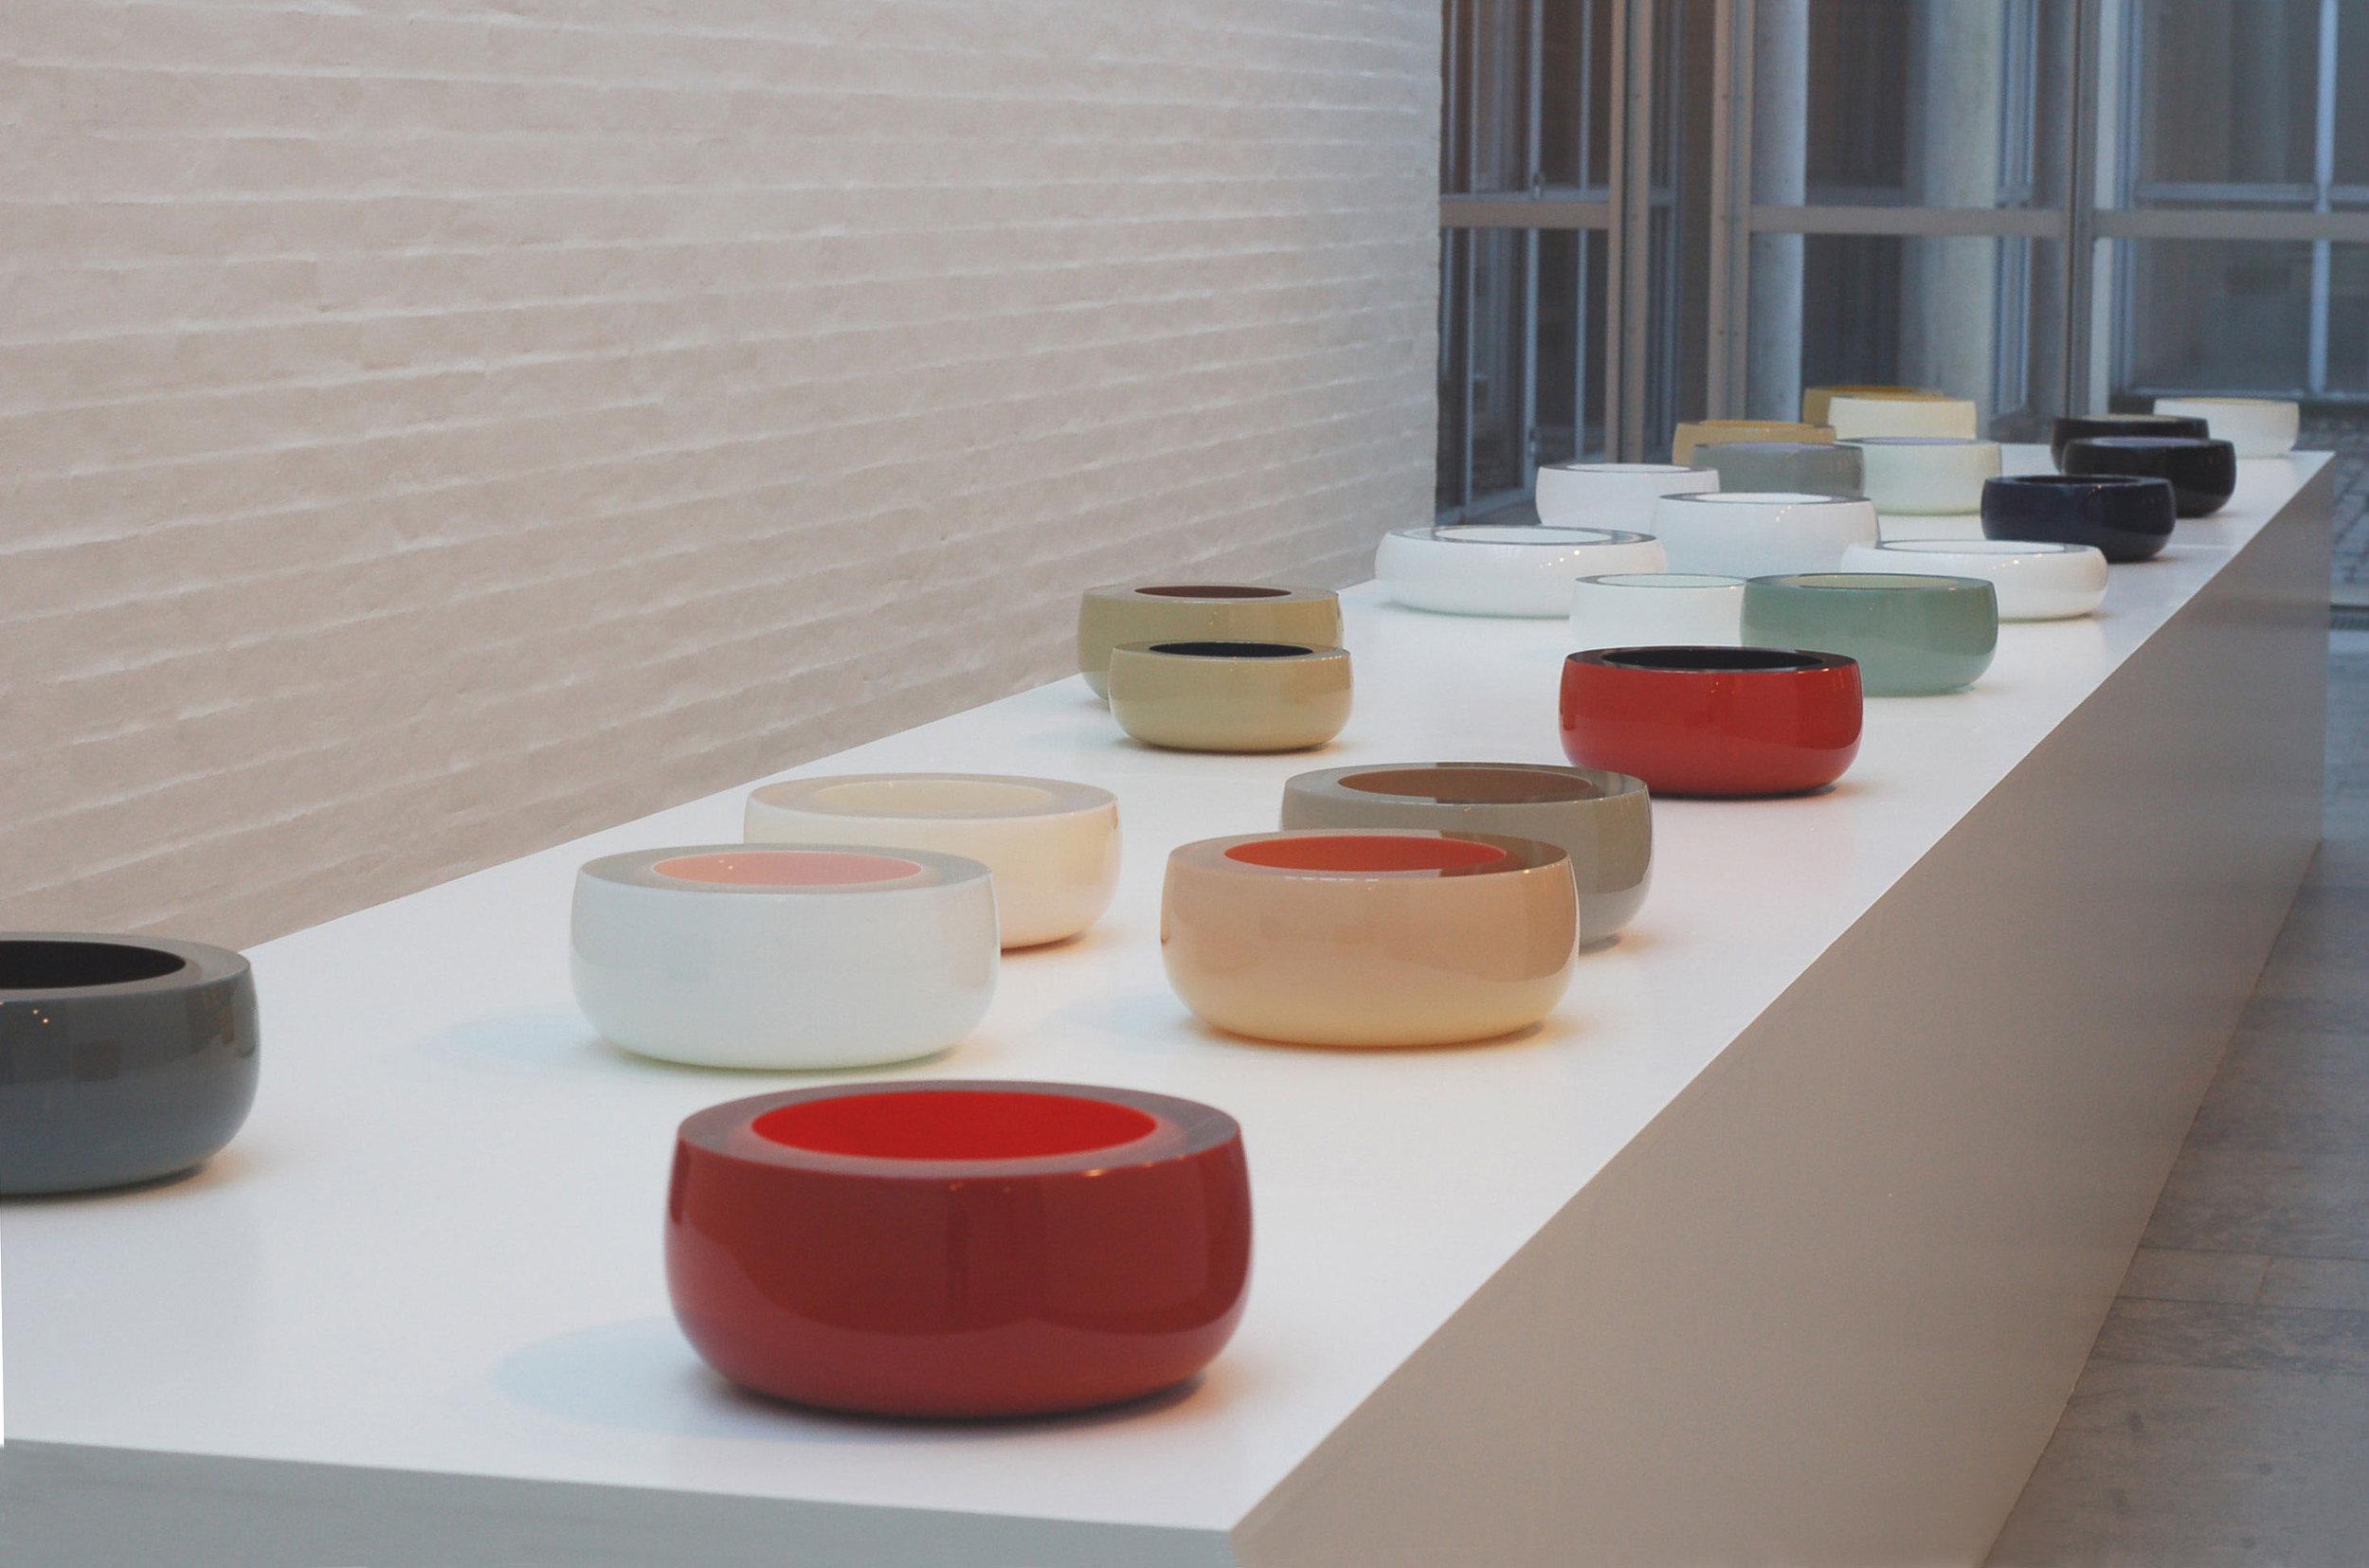 glass-bowls-exhibited-4-kopi.jpg